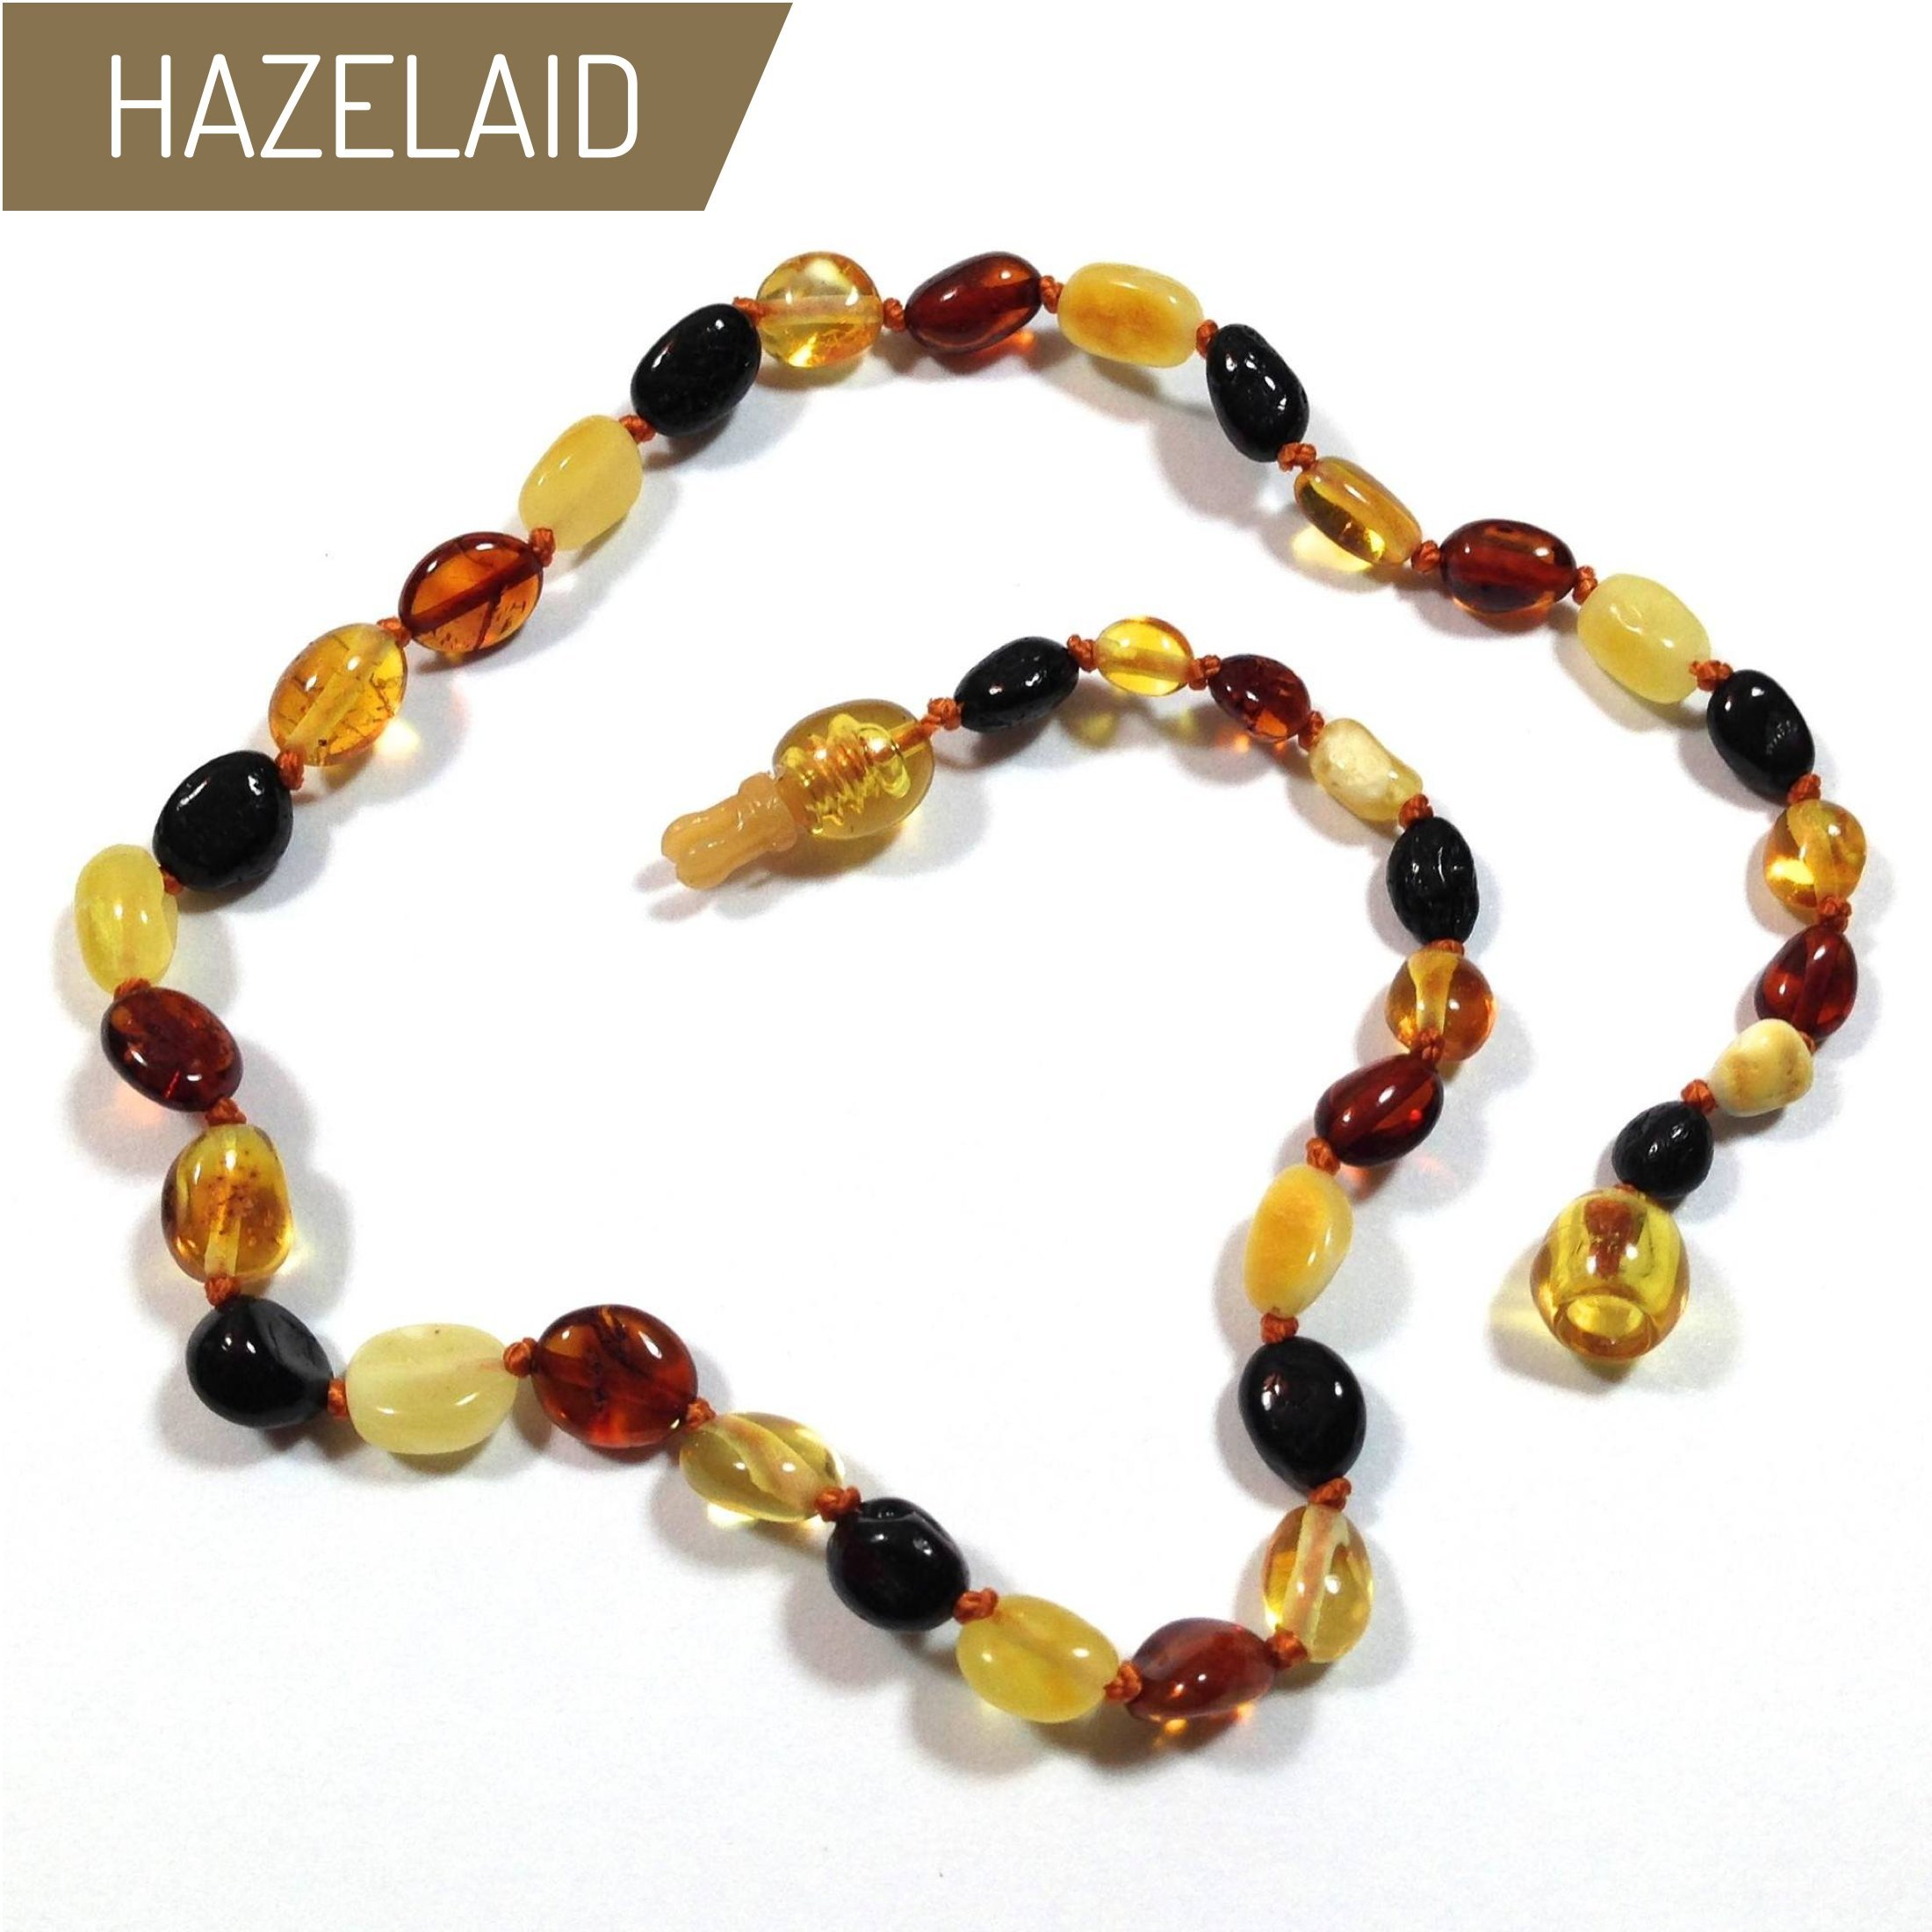 Hazelaid (TM) 14'' Pop-Clasp Baltic Amber Multicolored Bean Necklace